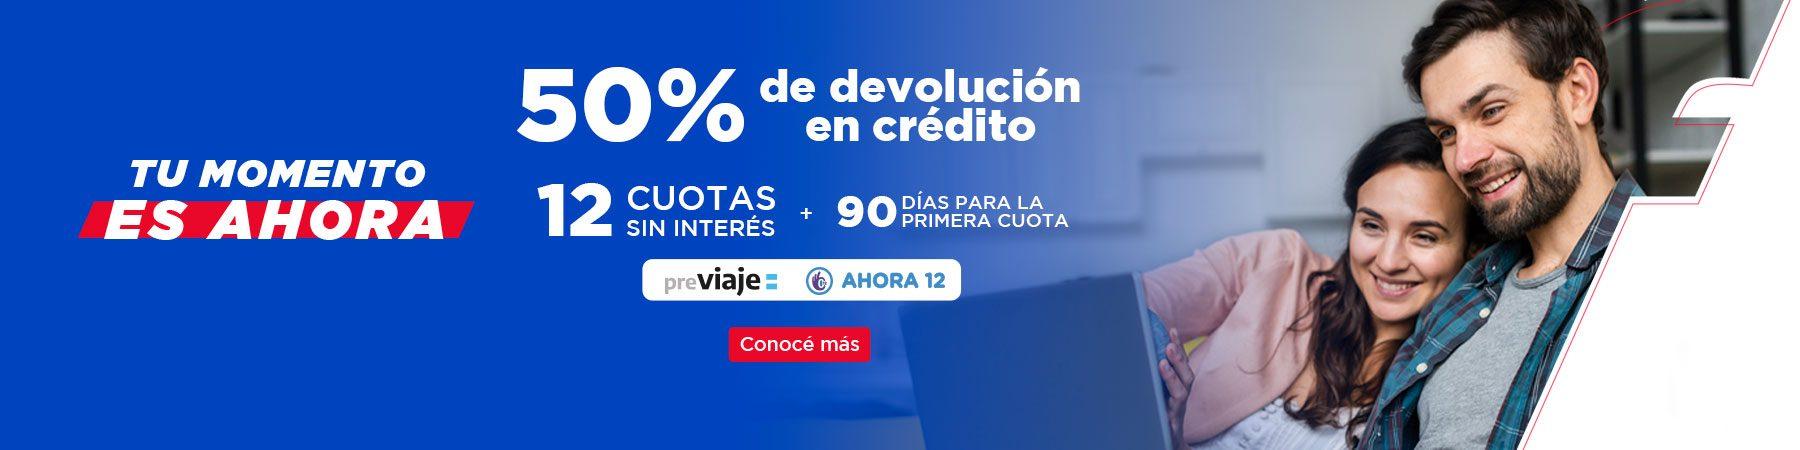 Previaje-programa-incentivo-gobierno-50-devolucion-credito-viajar-turismo-argentina-flecha-bus-micro-